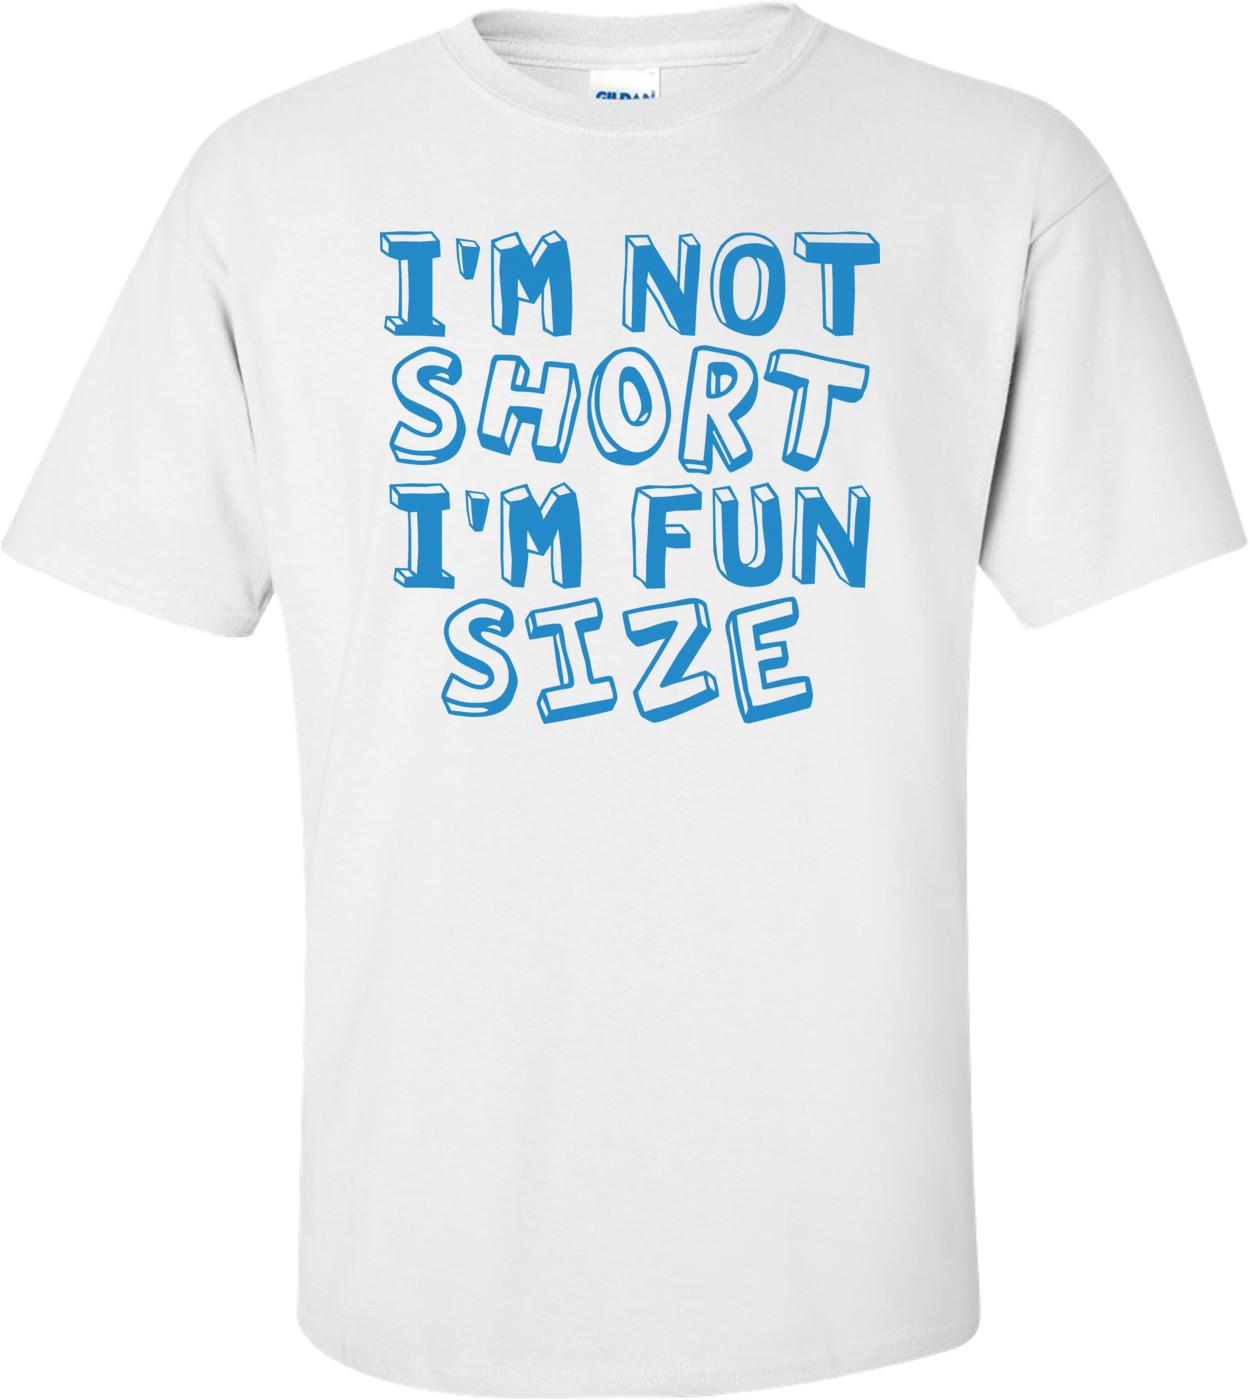 d13003175 im-not-short-im-fun-size-tshirt-3p.jpg